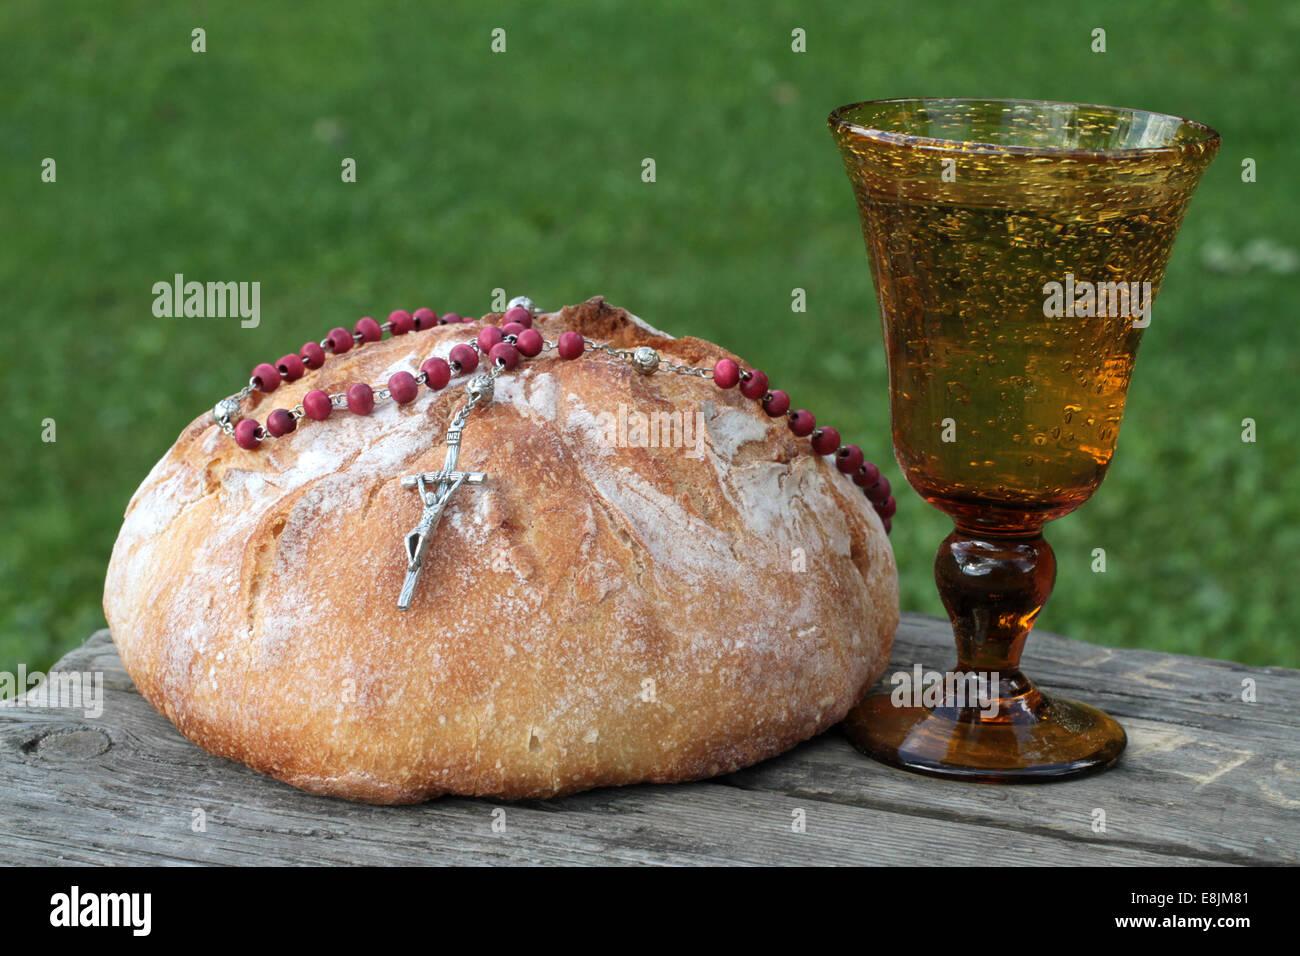 Lent. Share bread. - Stock Image